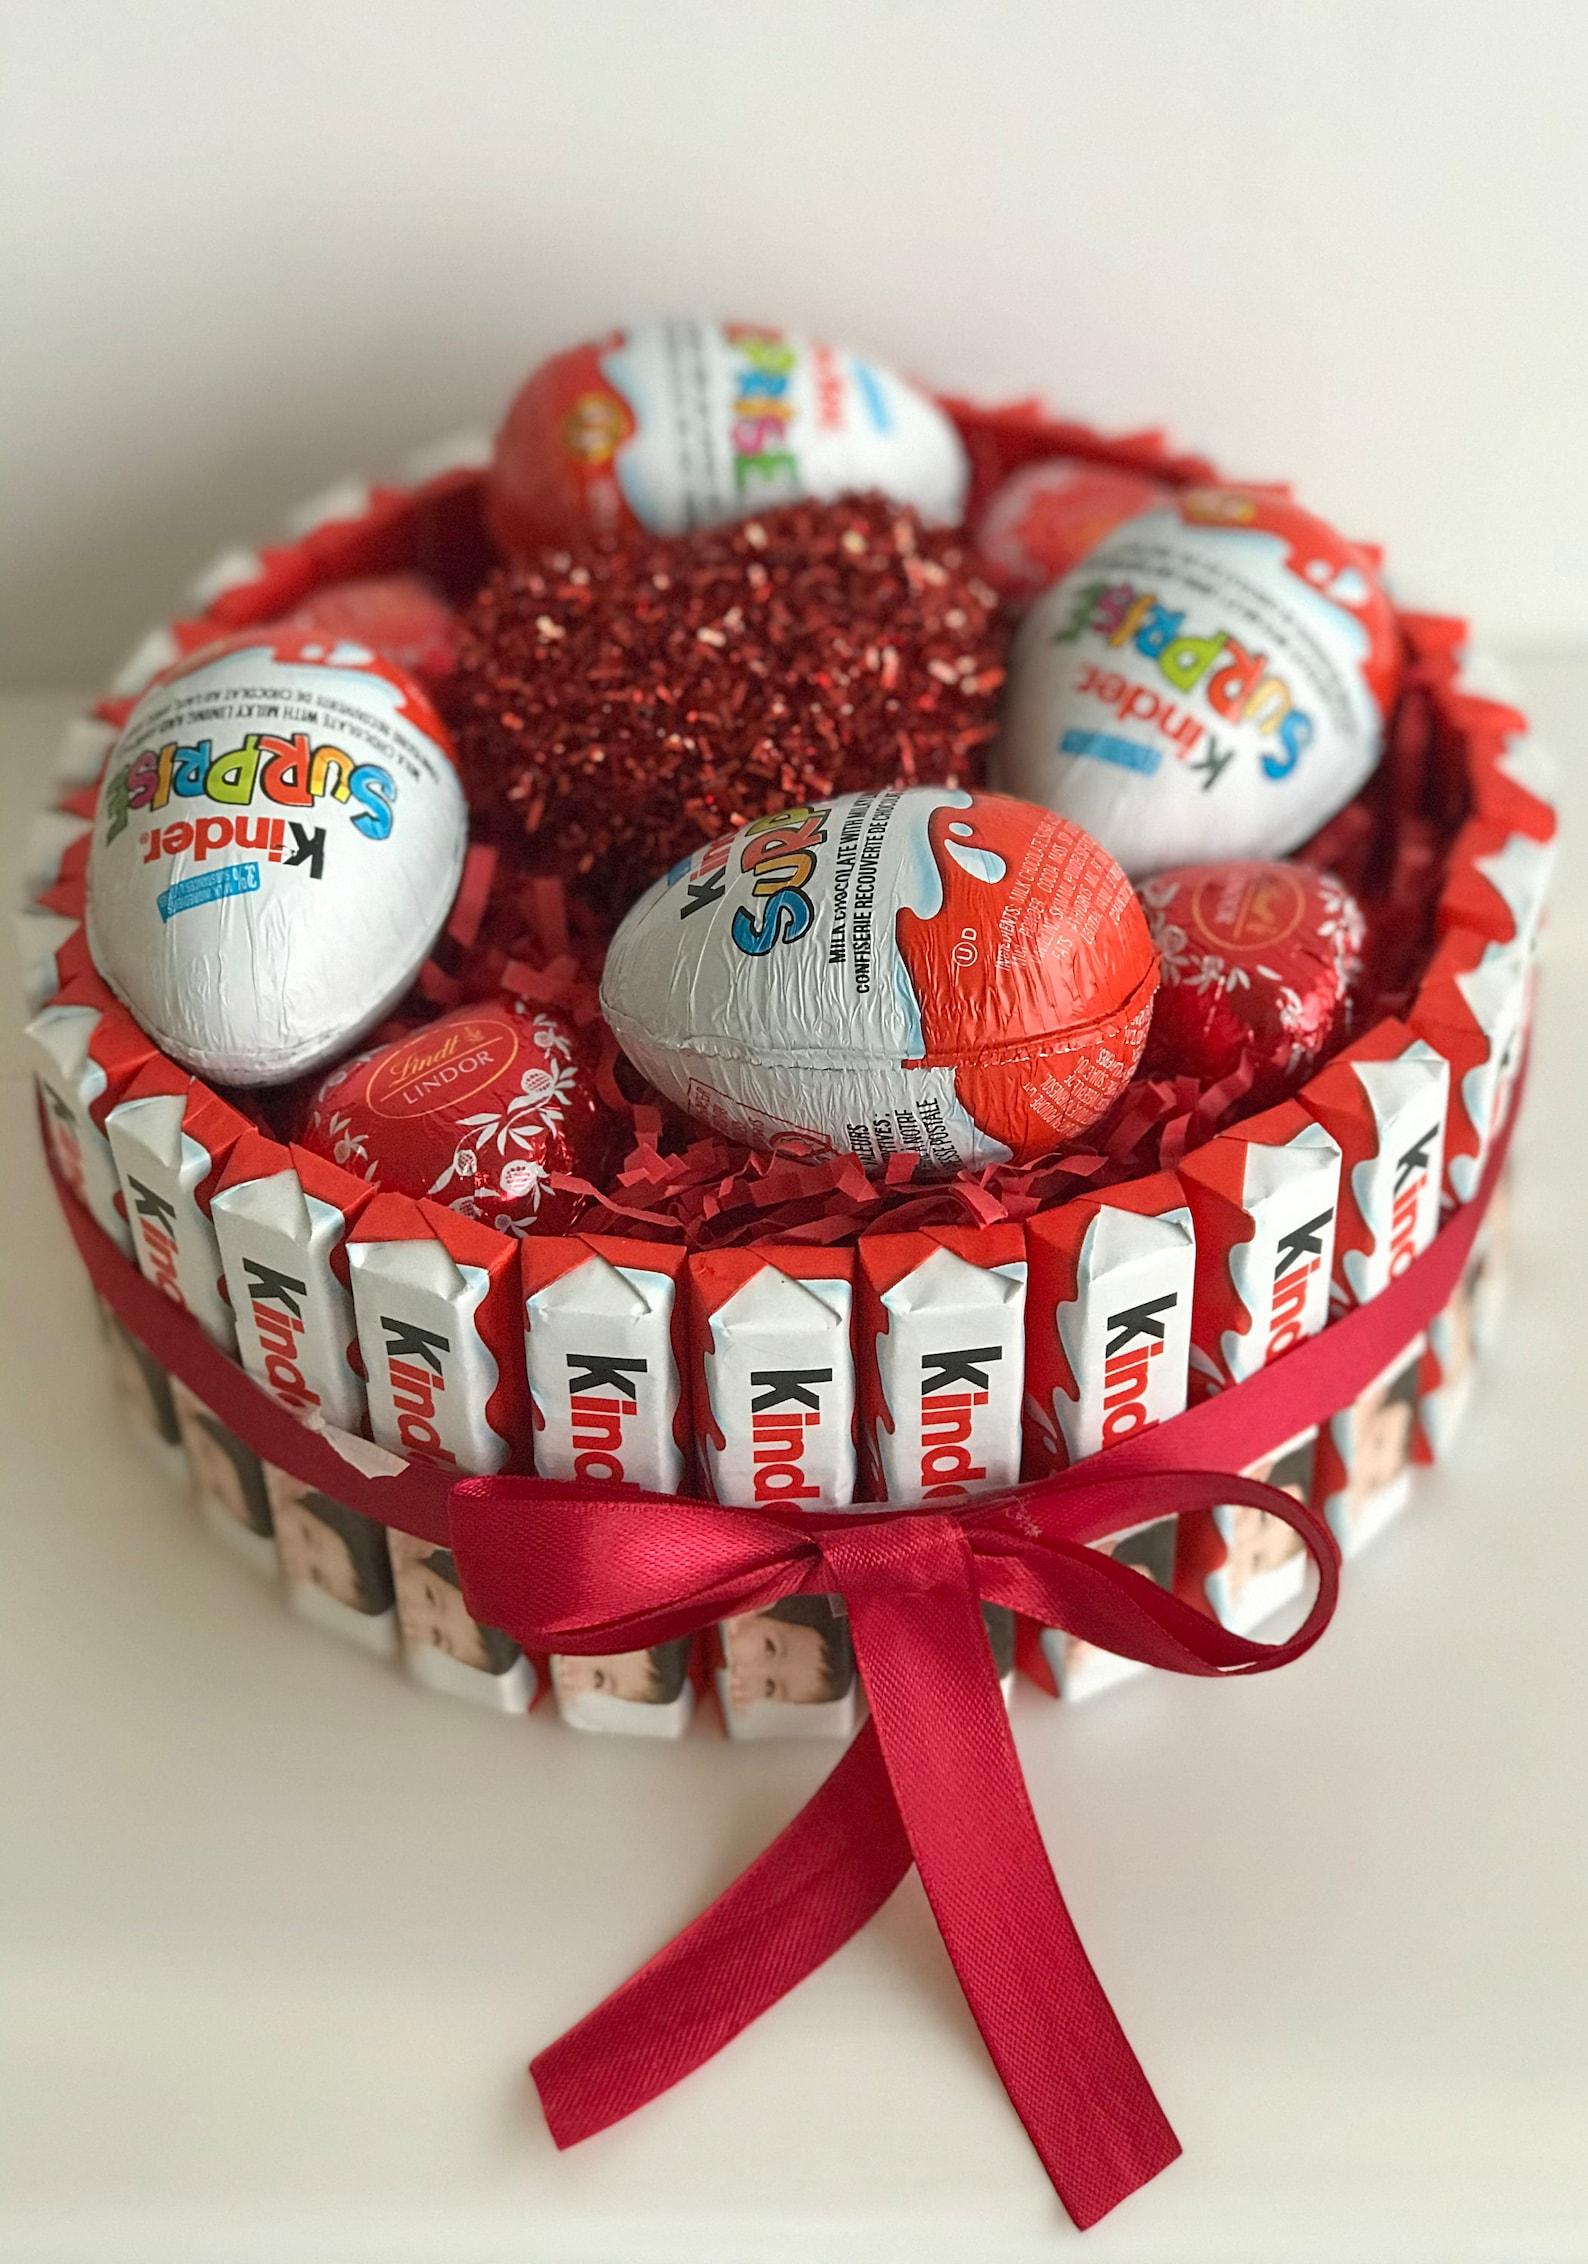 kinder Cake / Kinder Egg/Birthday Gift/Christmas Gift / Valentine Day Gift / Sweet Gift /Chocolate heart /Surprise Gift / Chocolate gift